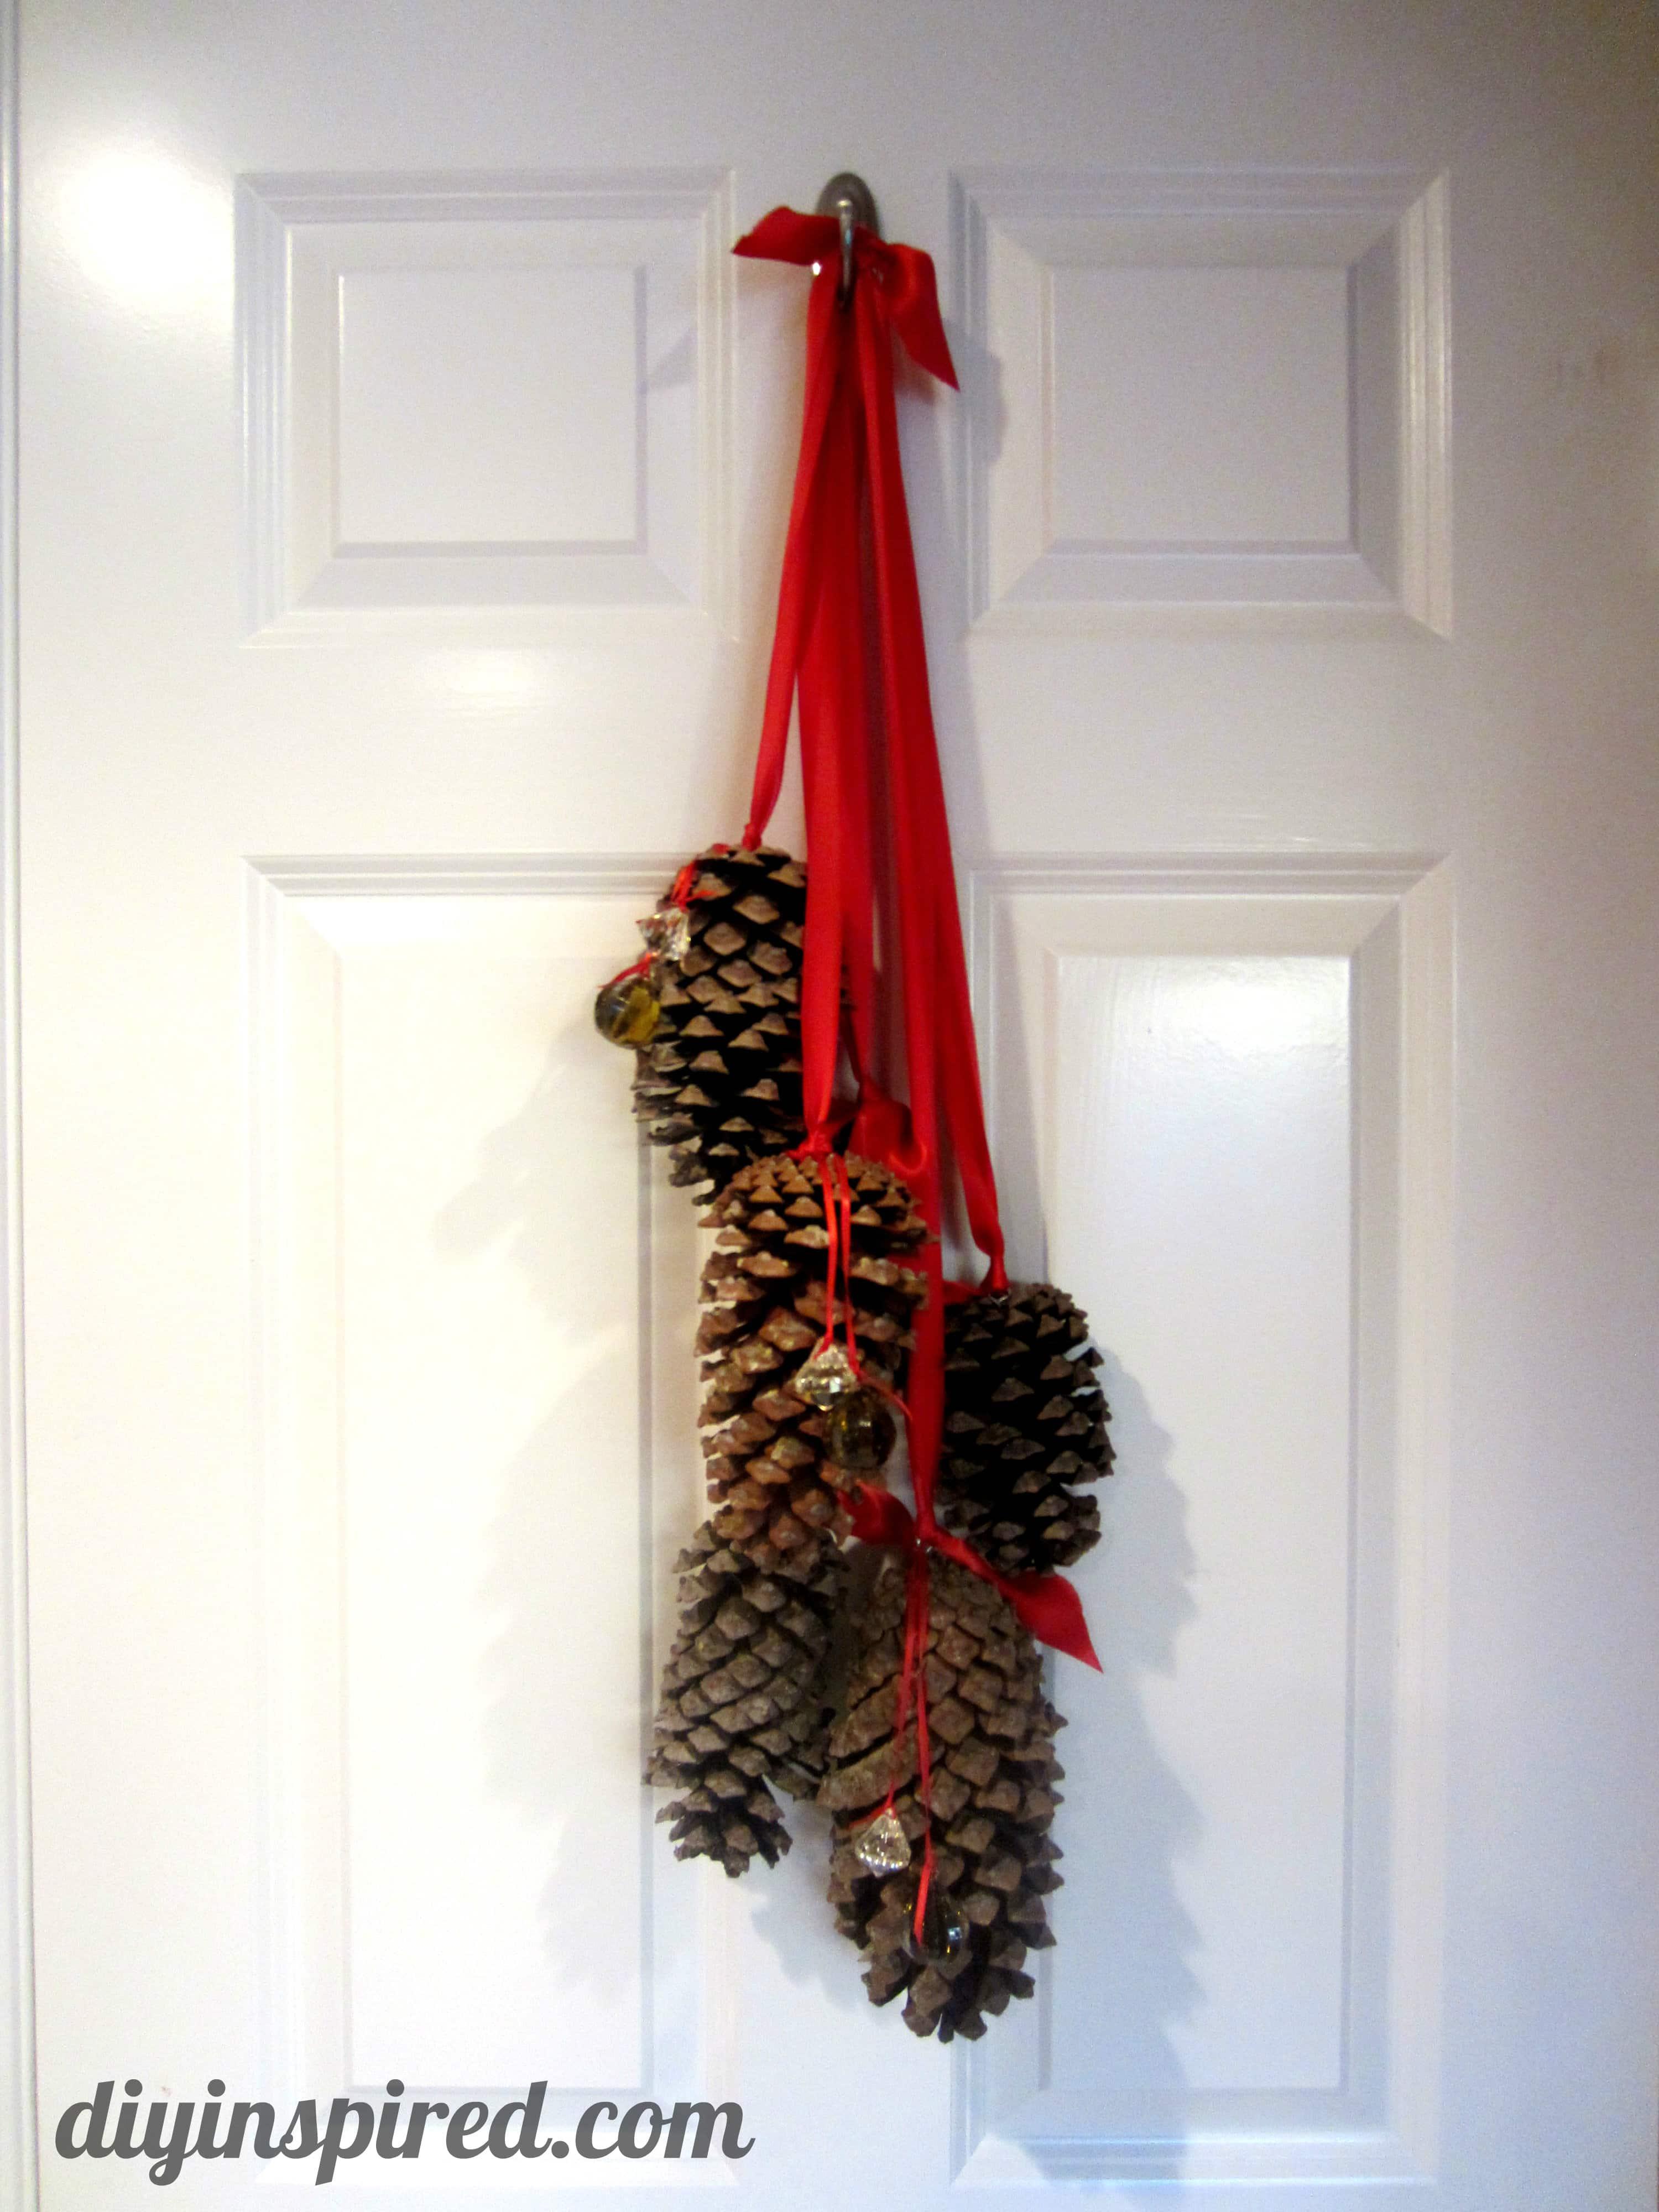 Hanging Pine Cone Decoration  DIY Inspired